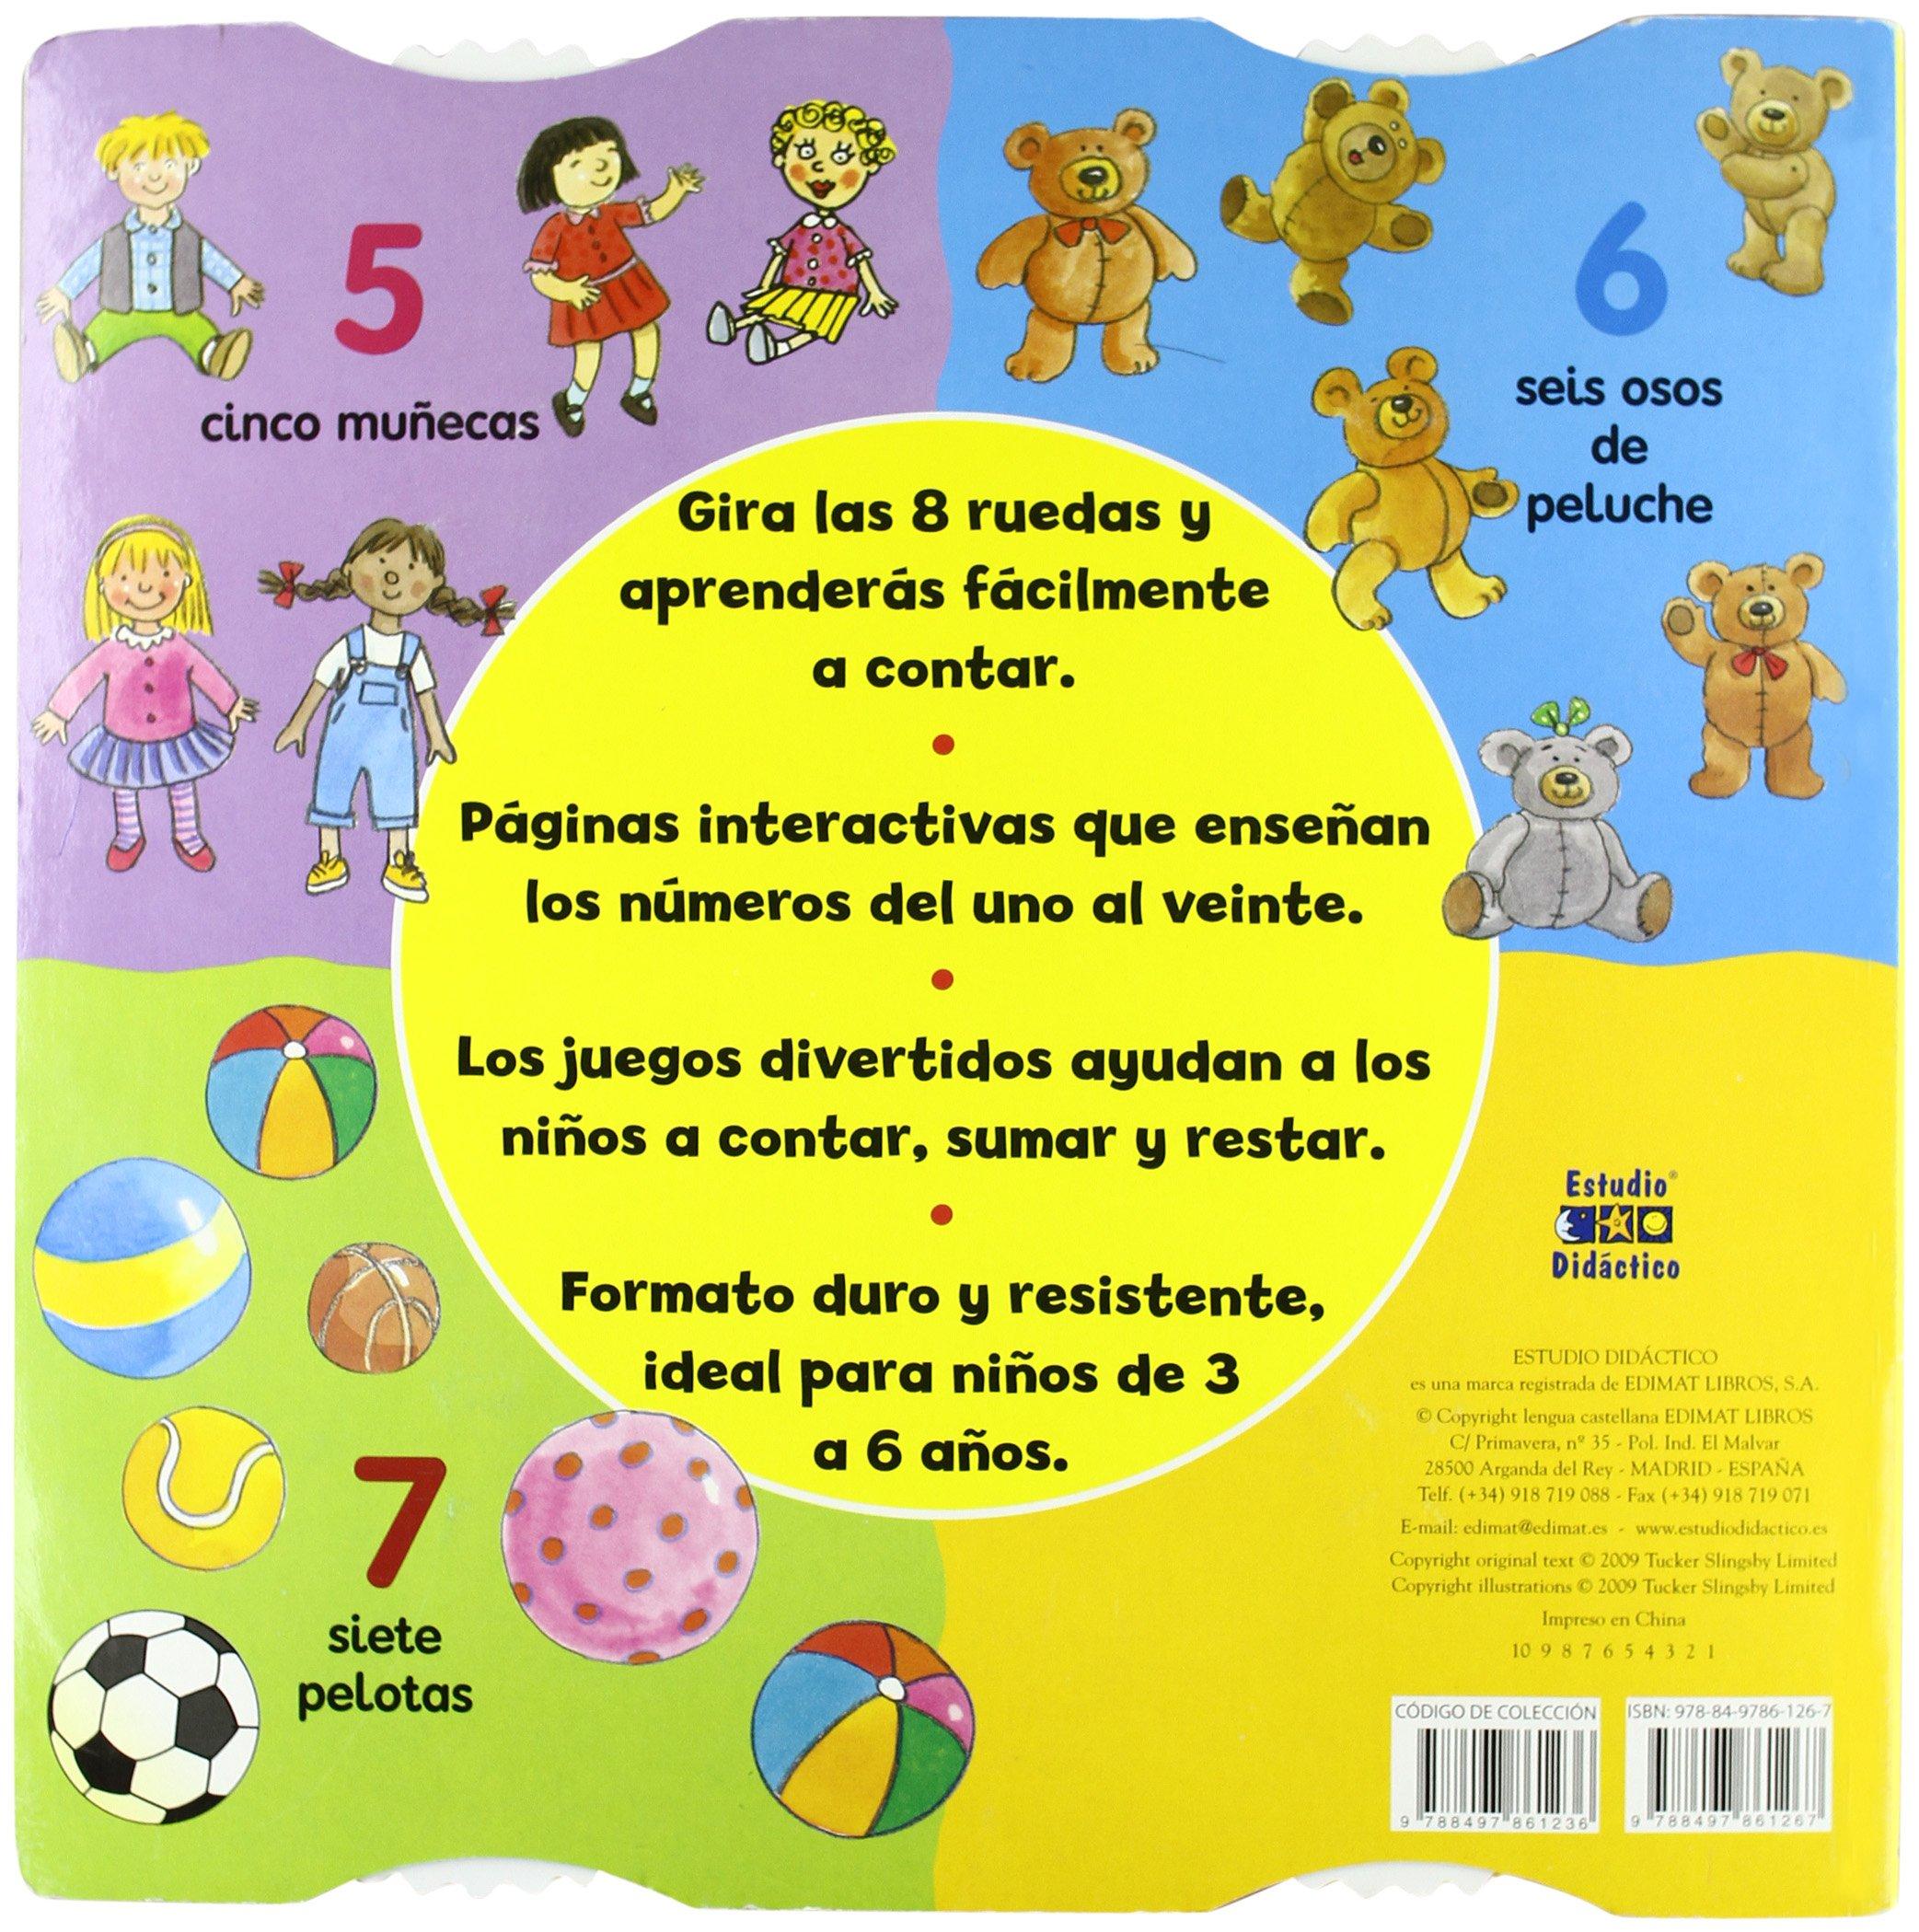 Amazon.com: 123: Gira la rueda, aprende a contar (Spanish Edition) (9788497861267): Tucker Slingsby Ltd.: Books